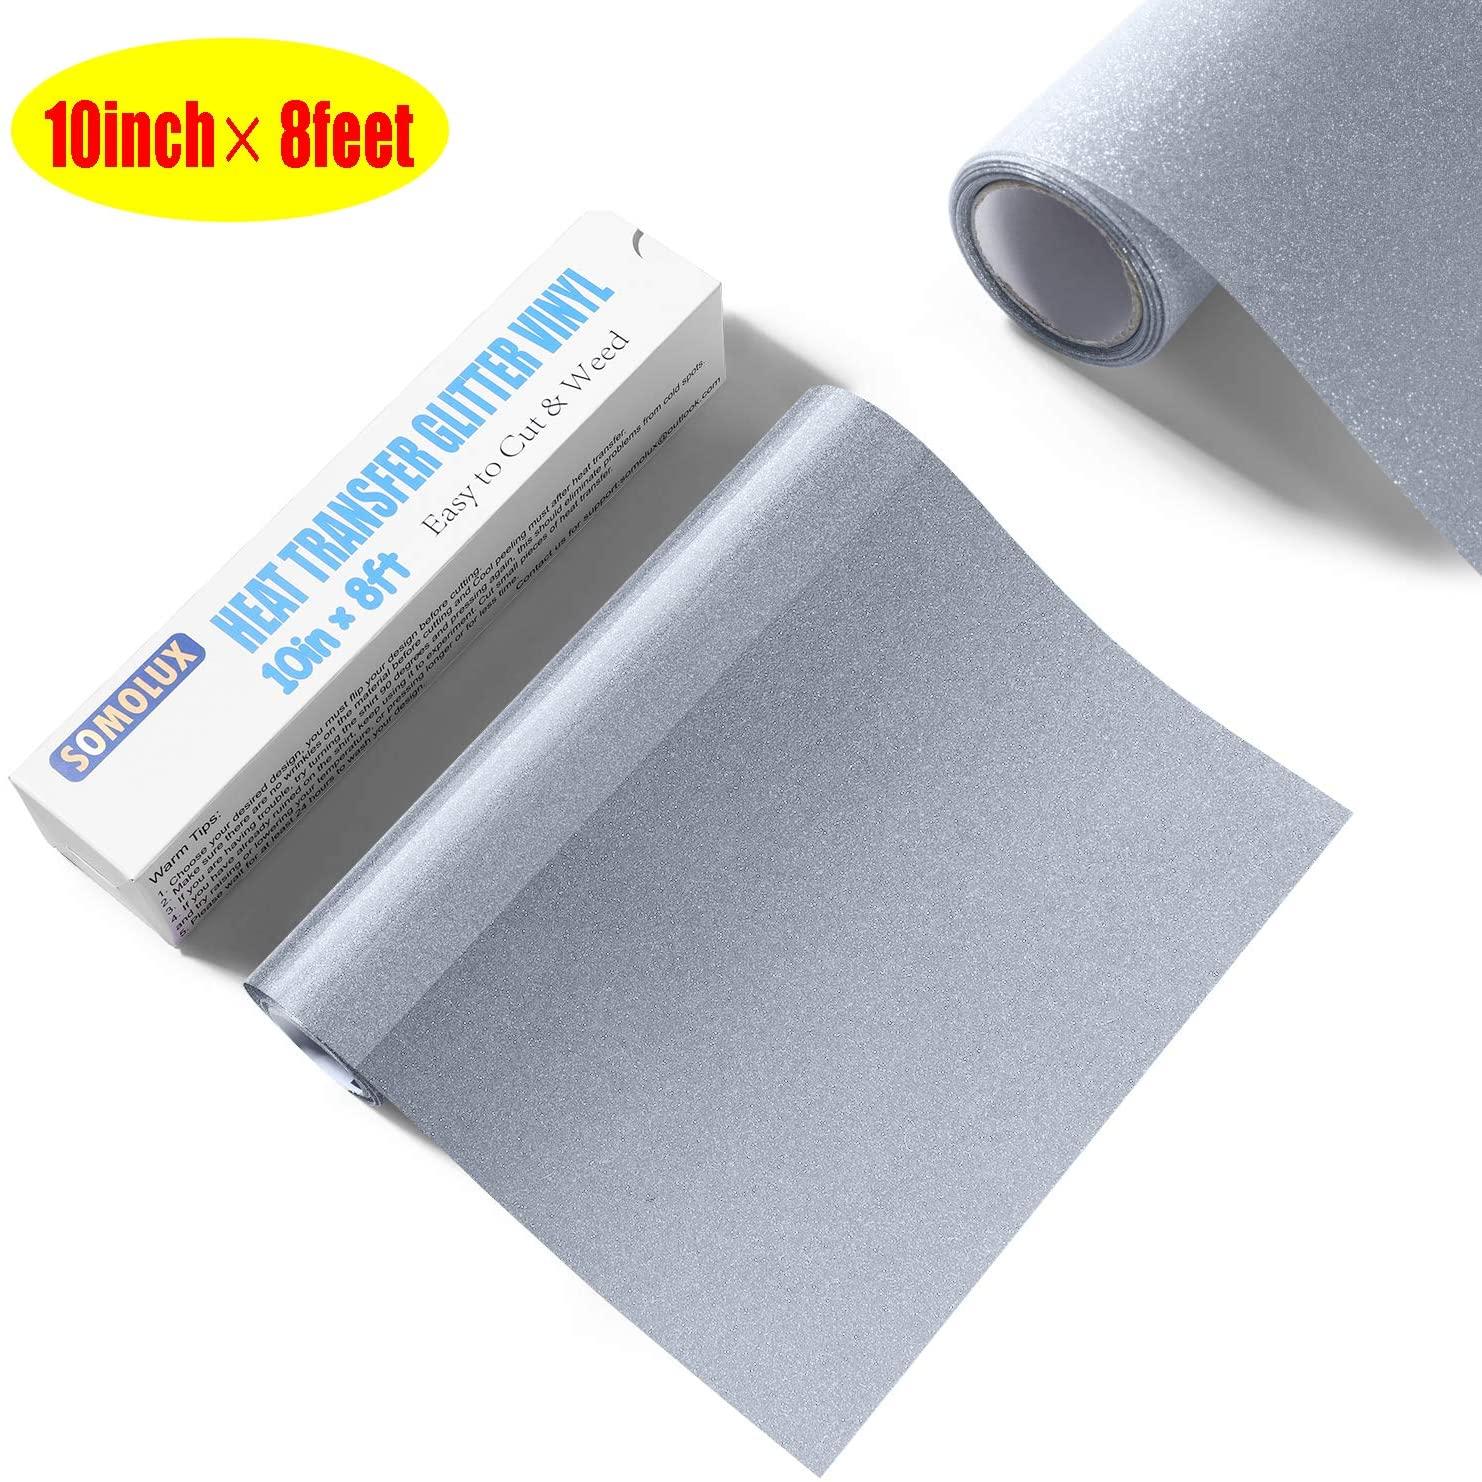 SOMOLUX Glitter HTV Iron on Vinyl 10inch x 8feet Roll Easy to Cut & Weed Heat Transfer Vinyl DIY Heat Press Design for T-Shirts Silver